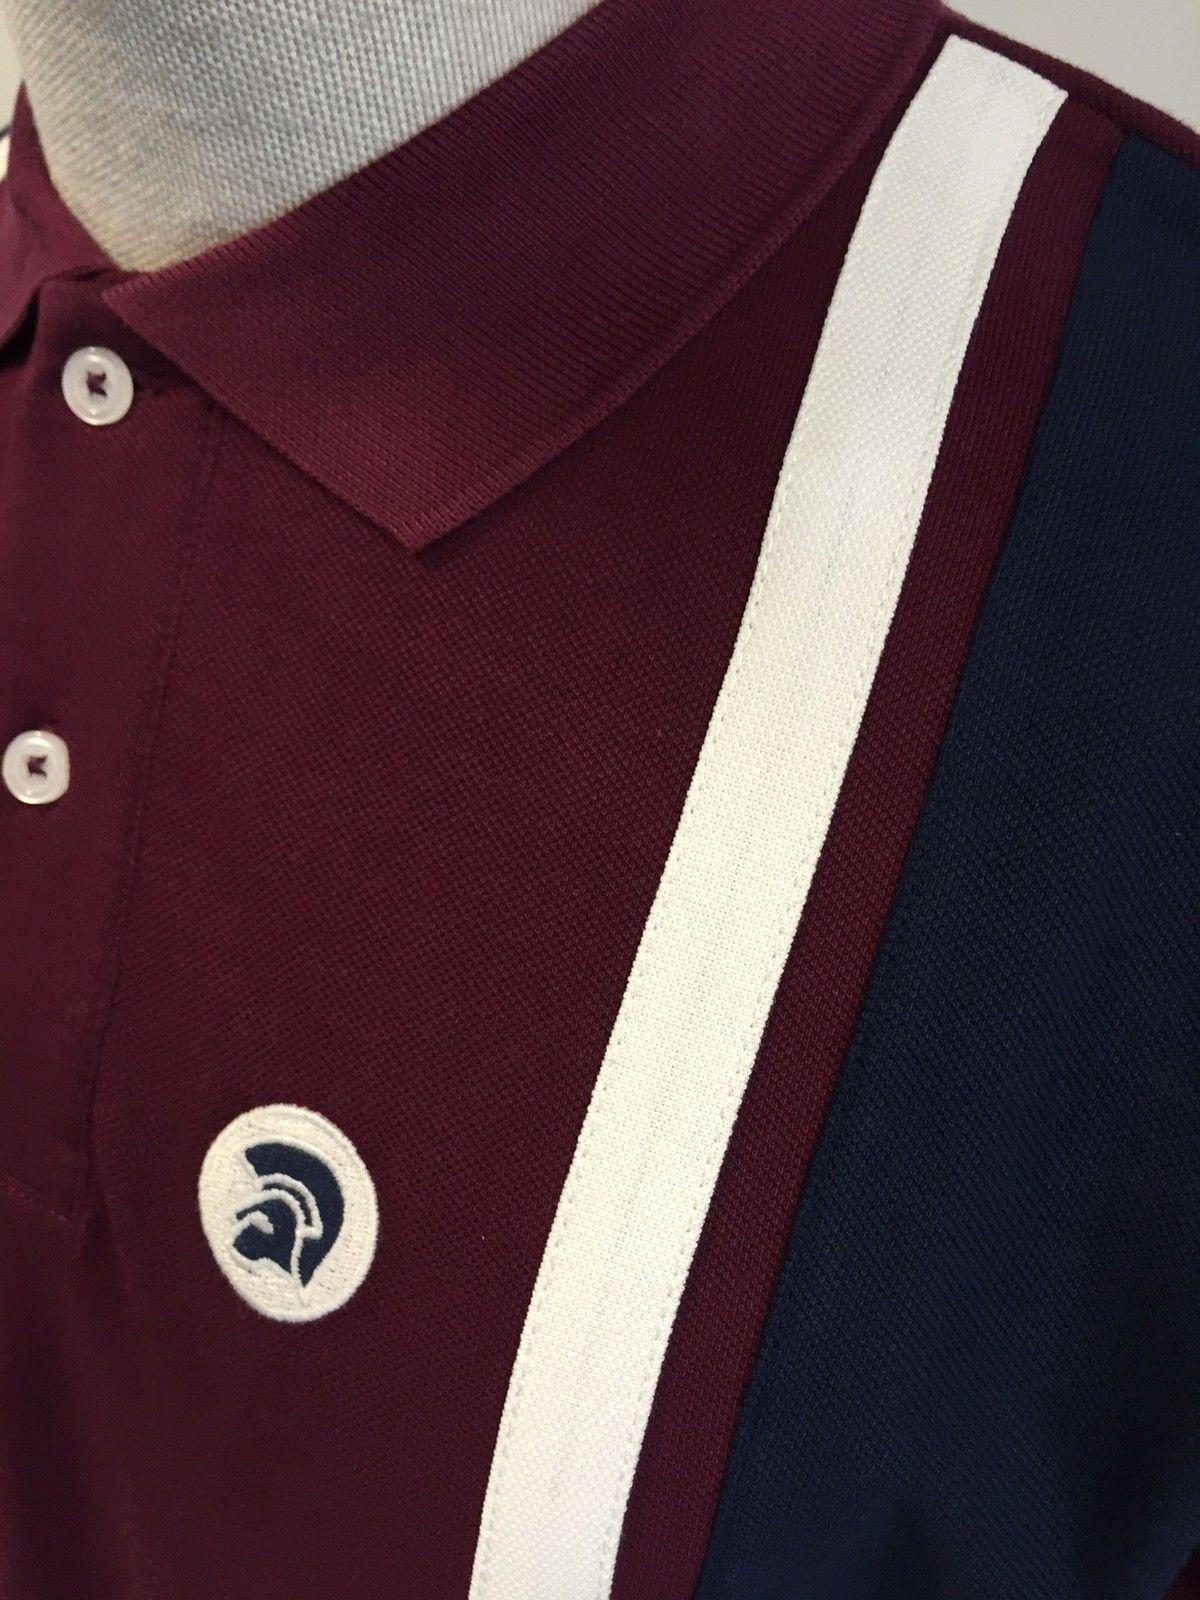 Trojan TR//8183 maroon short sleeve stripe front pique polo shirt size small-3XL